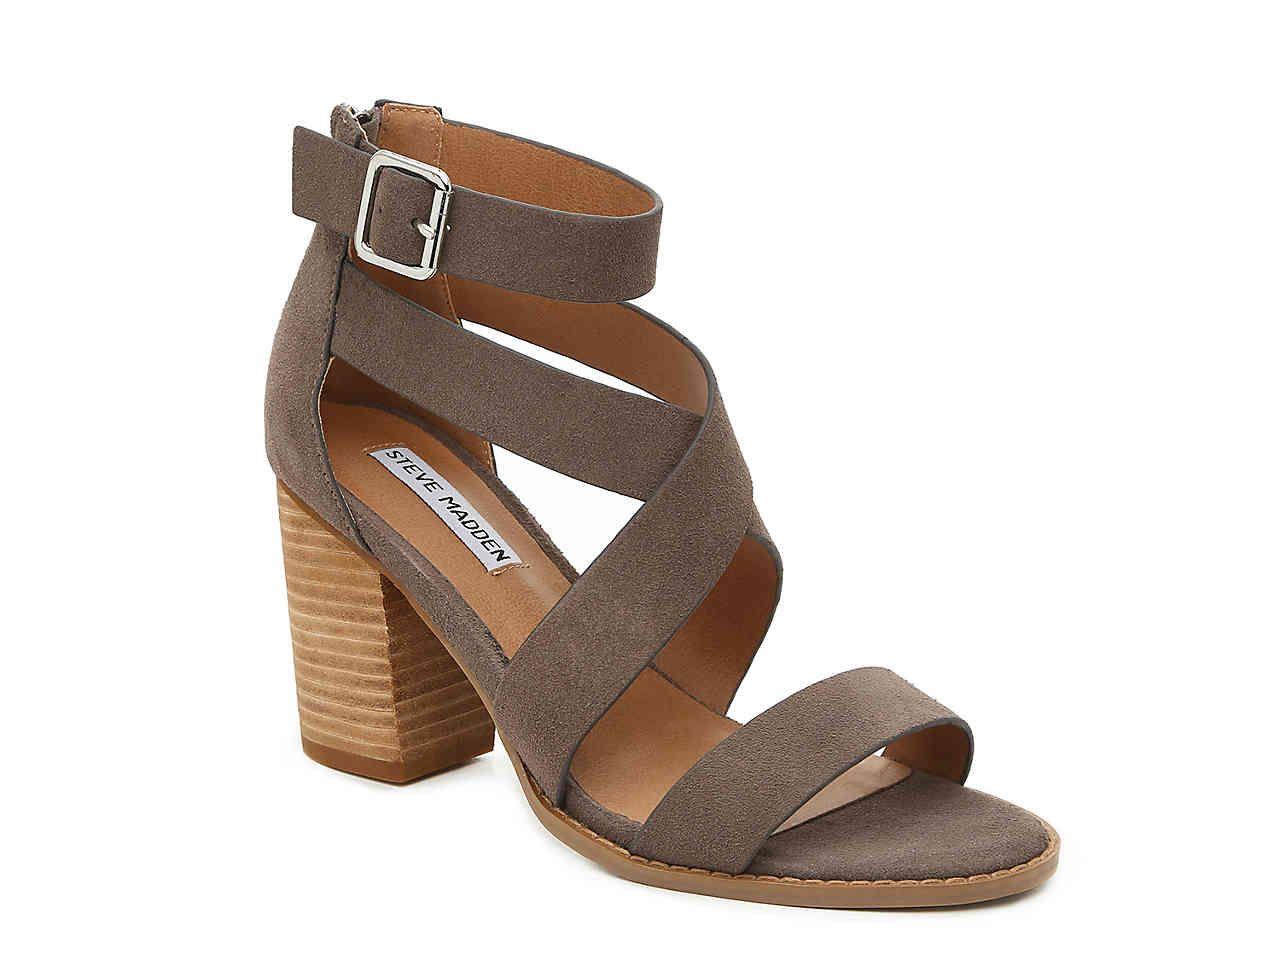 Steve Madden Elita Sandal   Lacoste shoes women, Women shoes ...